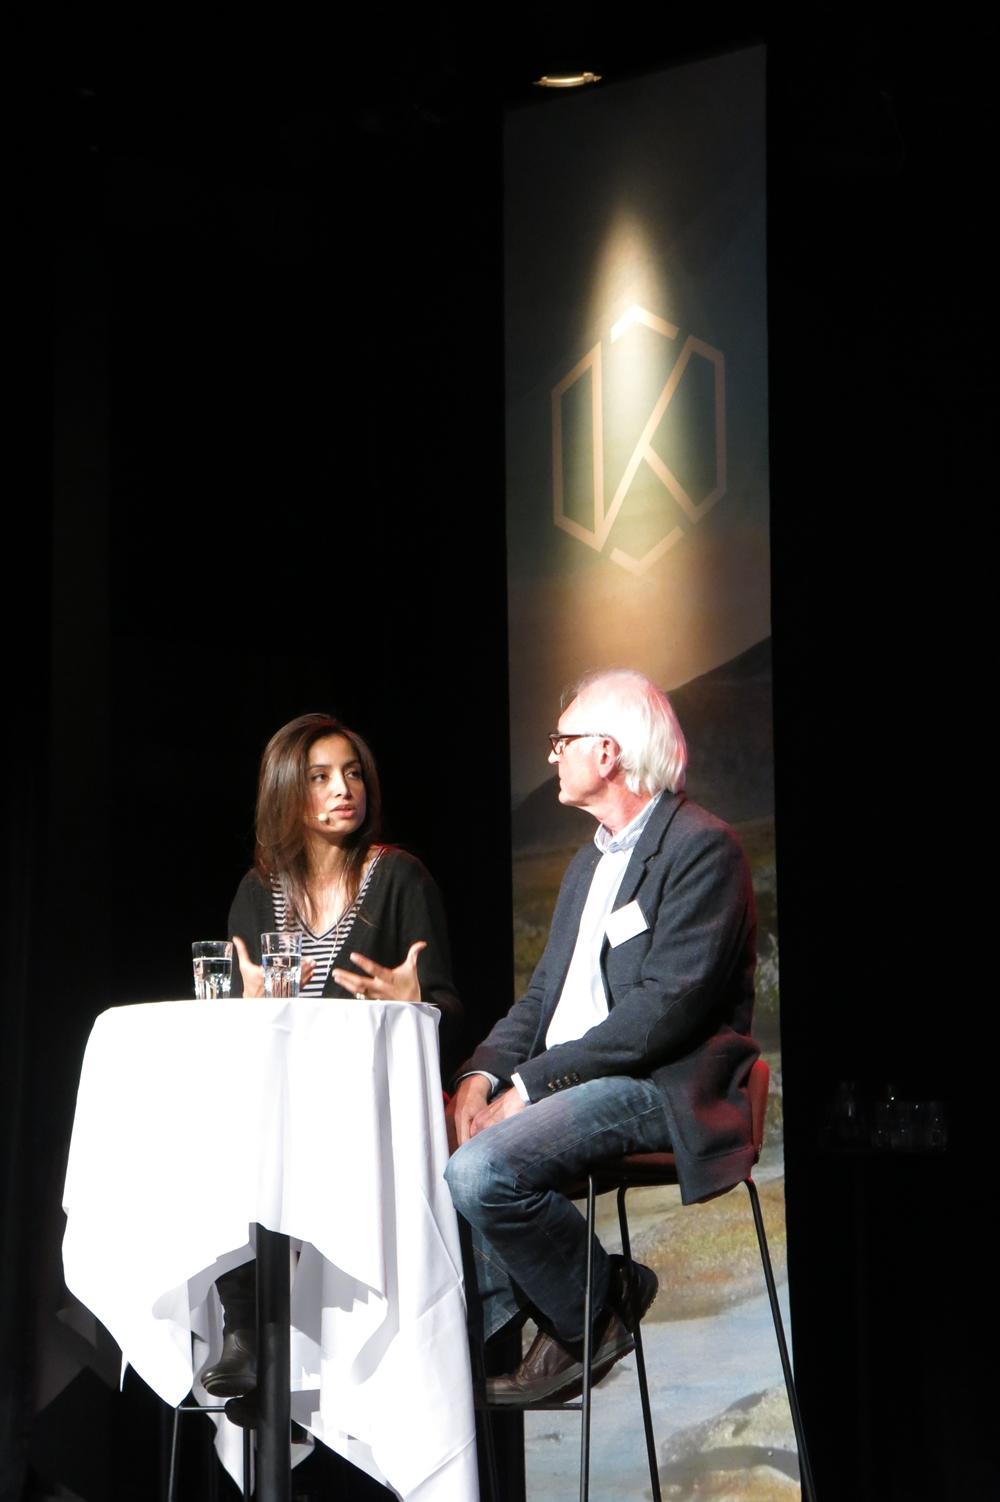 Ole Reitov i samtale med Deeyah (foto: Cecilie Breivik Hansen).